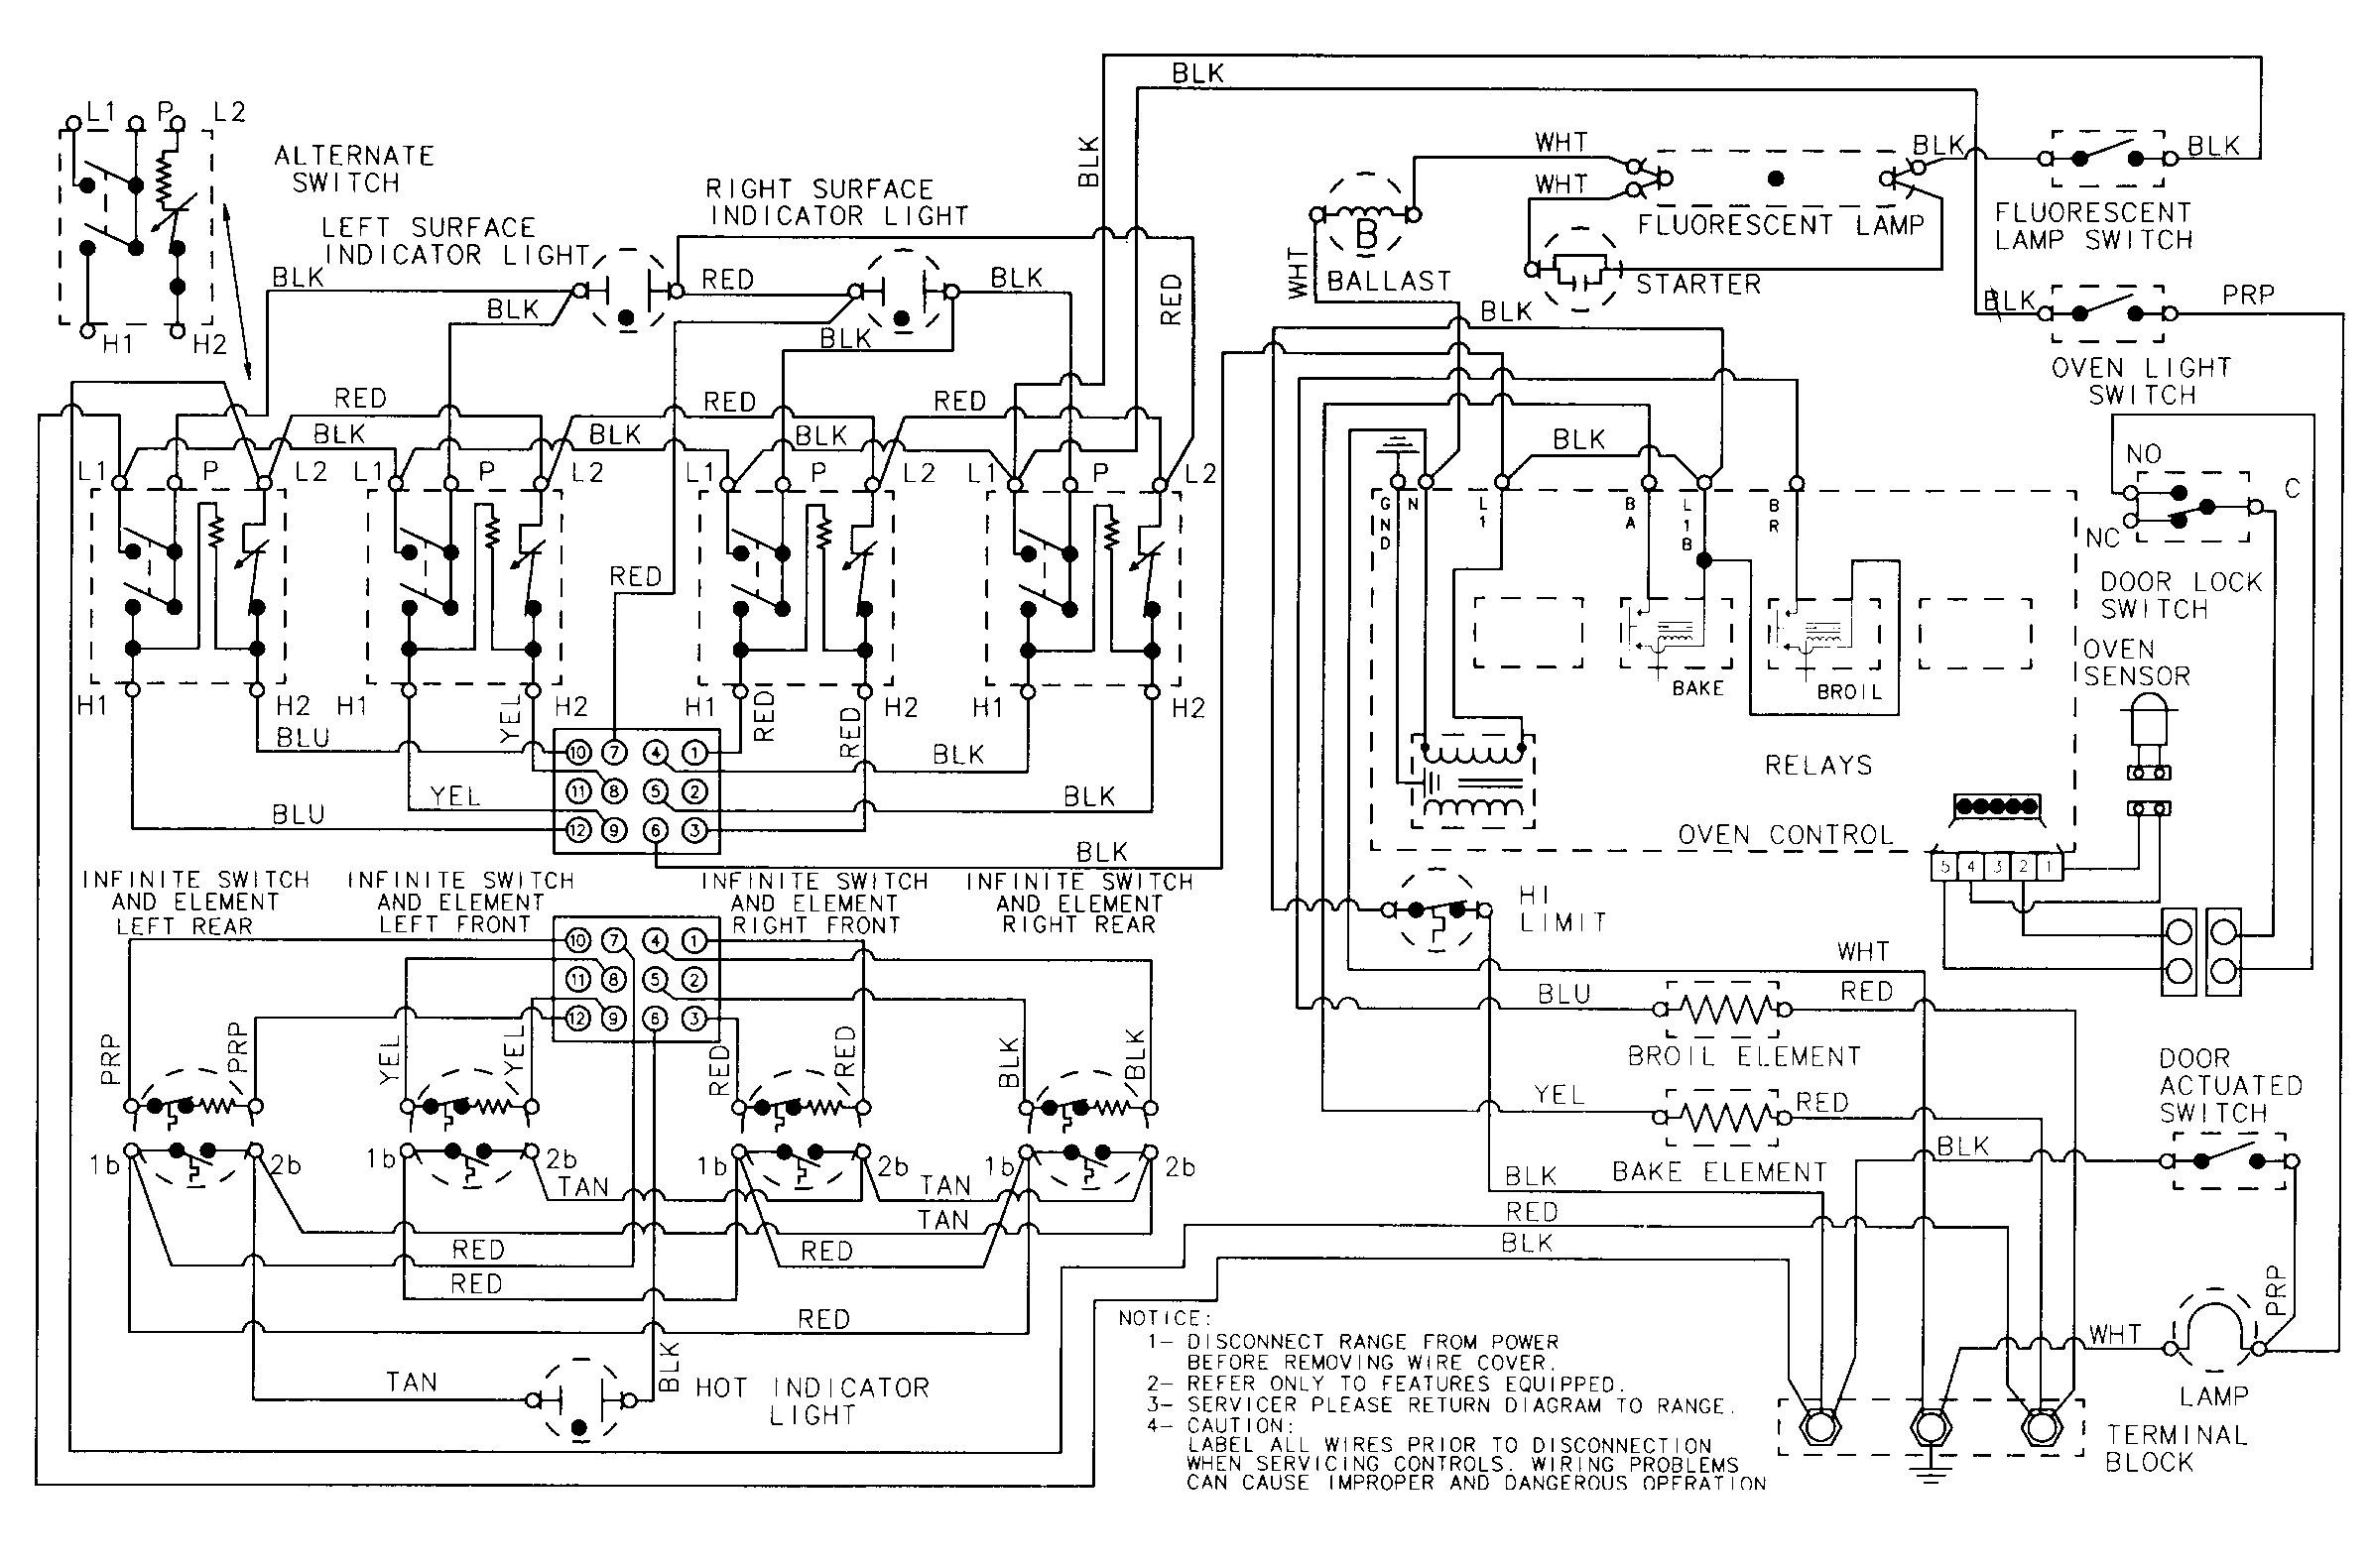 Wiring Diagram Maytag Performa Dryer